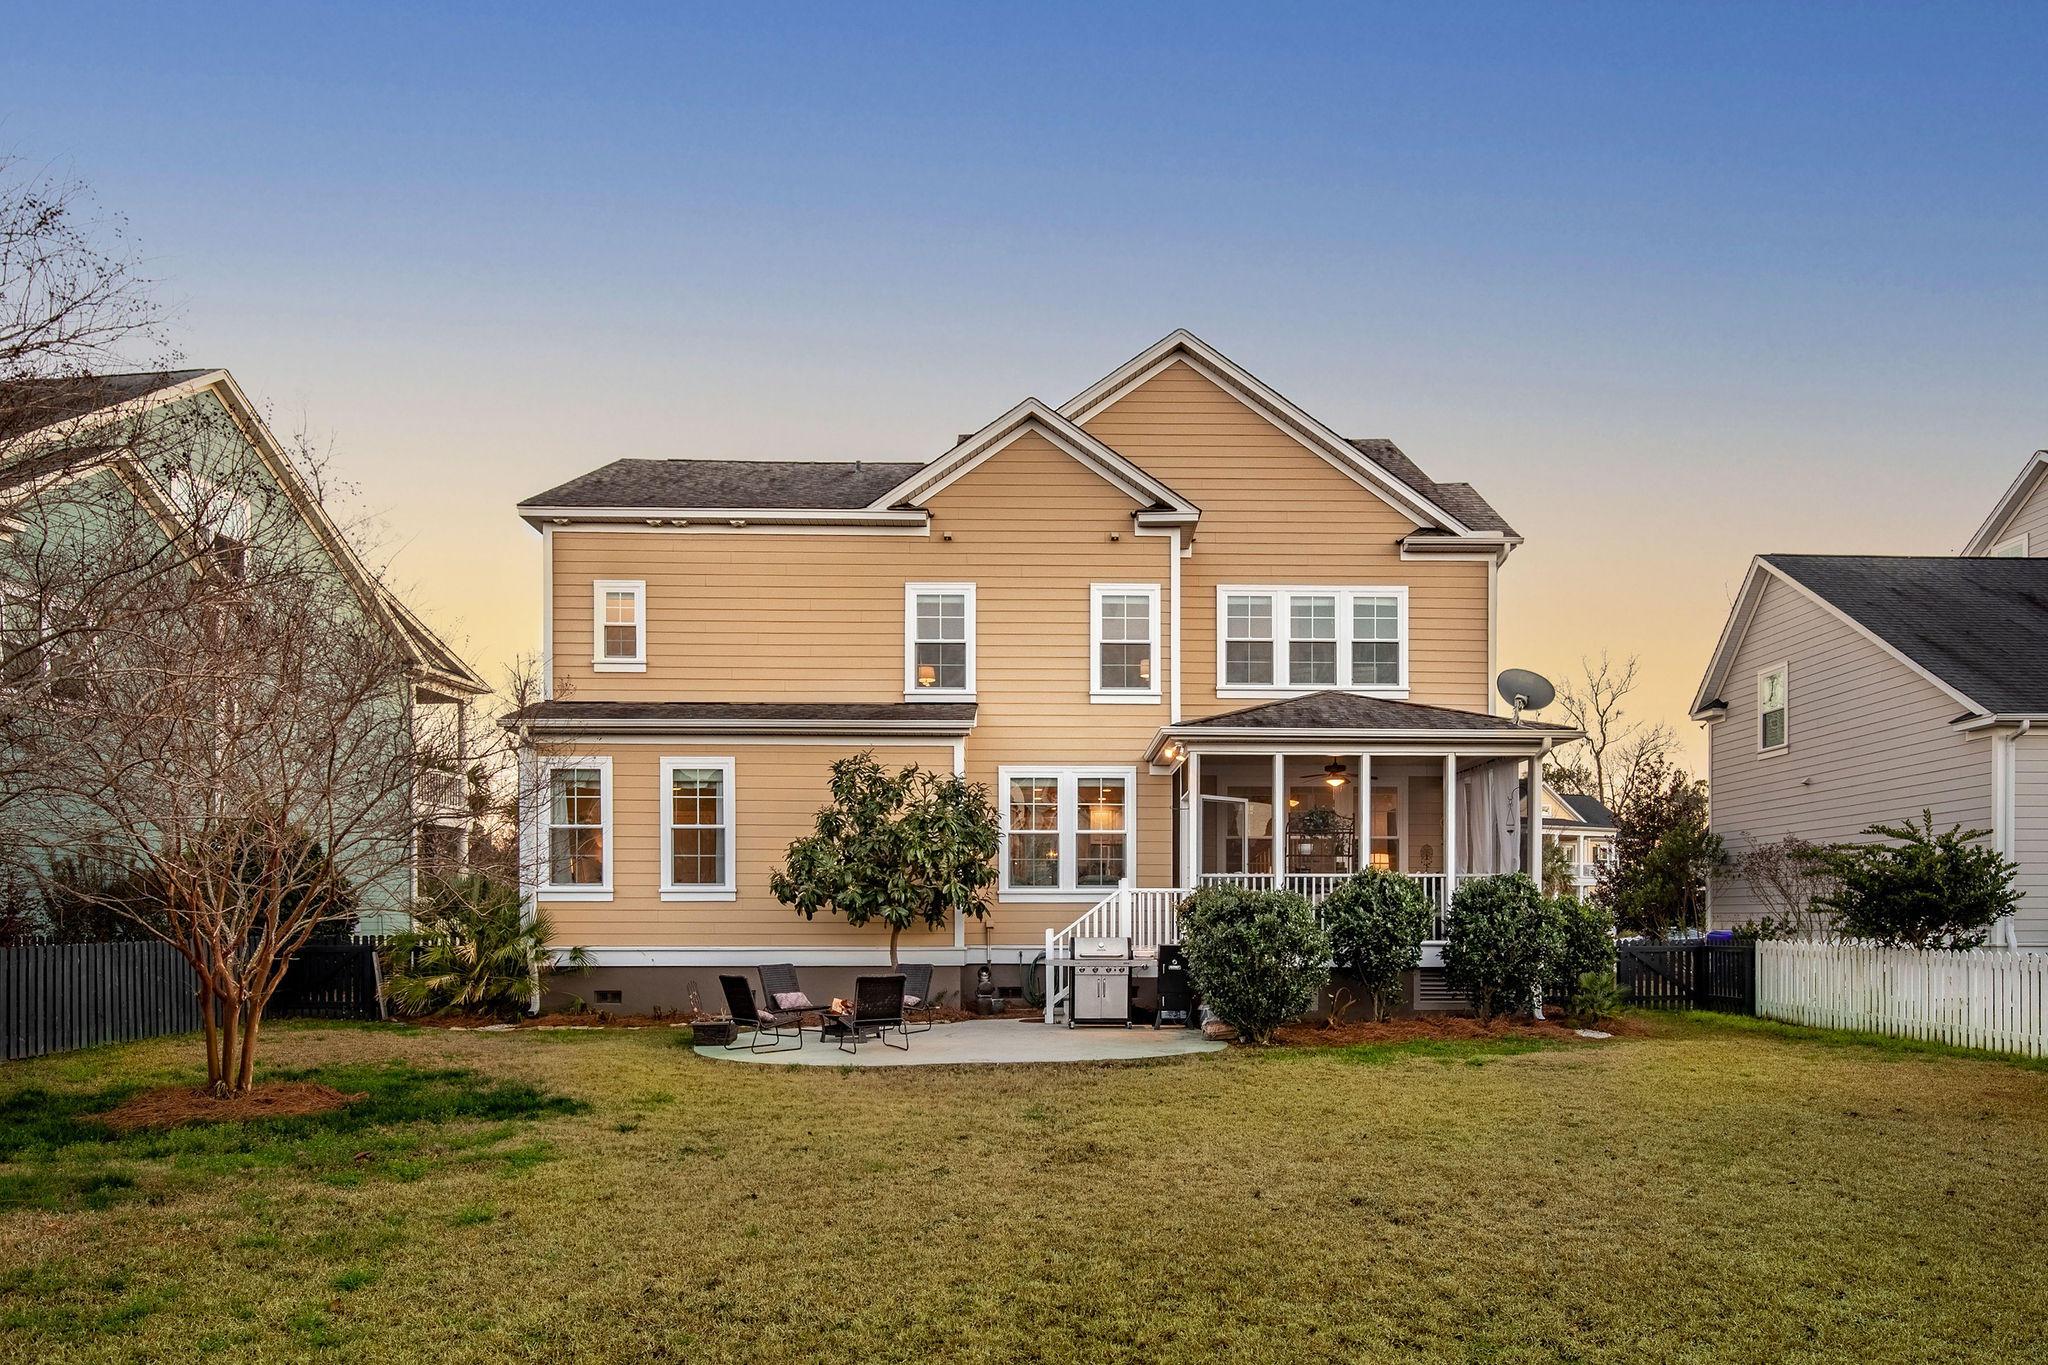 Dunes West Homes For Sale - 3212 Hatchway, Mount Pleasant, SC - 34